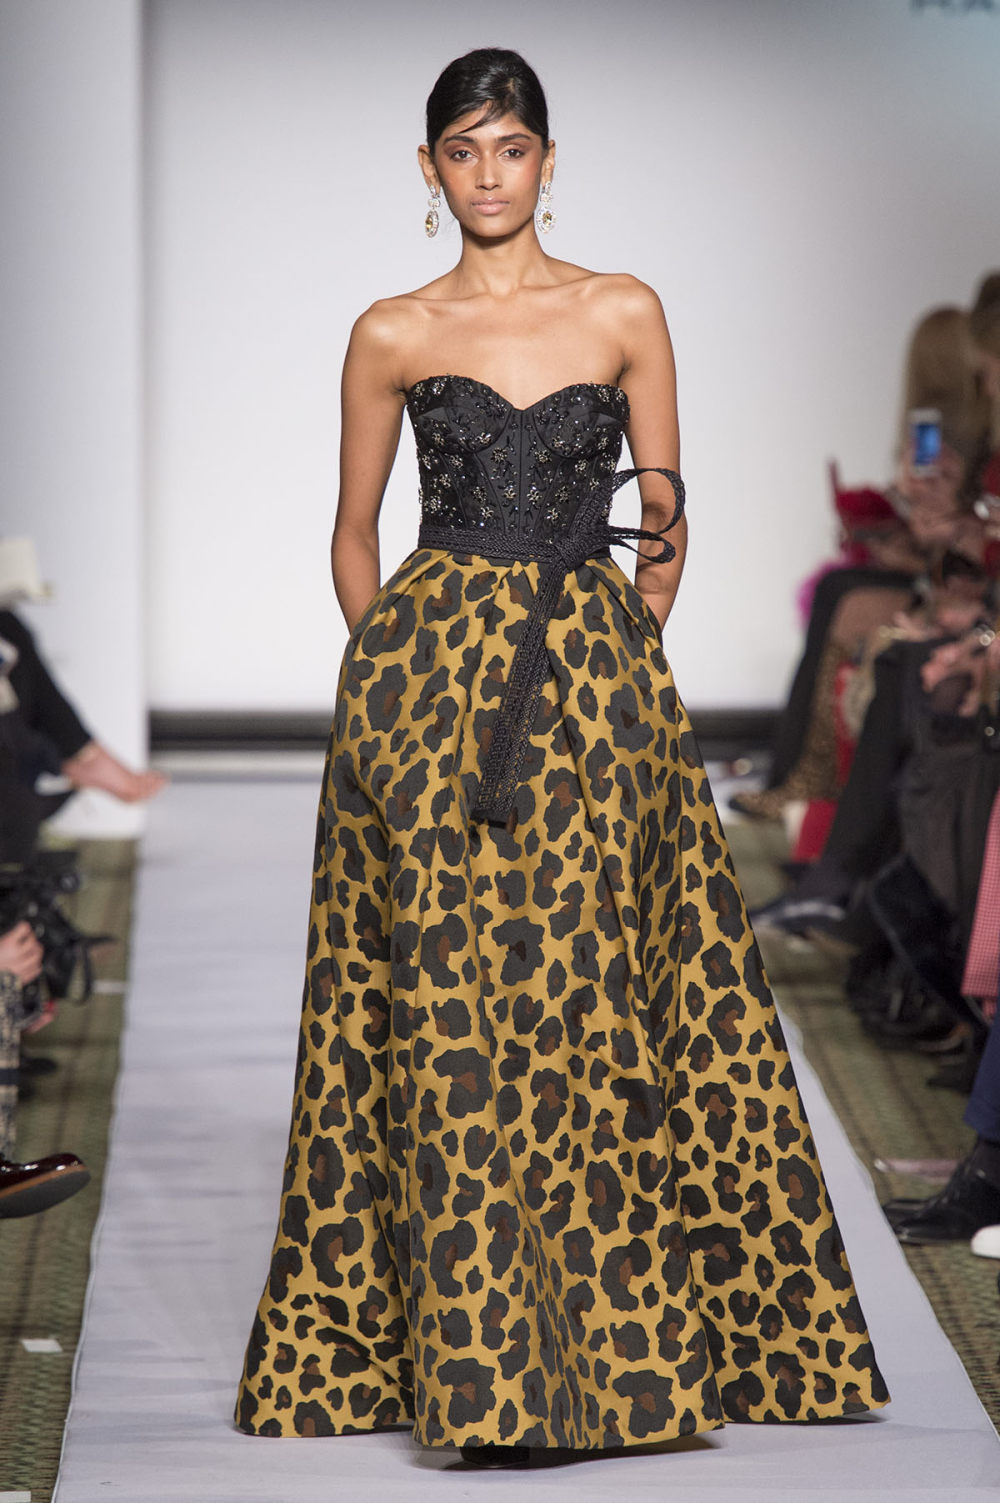 Carolina Herrera时装系列用鲜艳的颜色充满智能的黑白色调-5.jpg